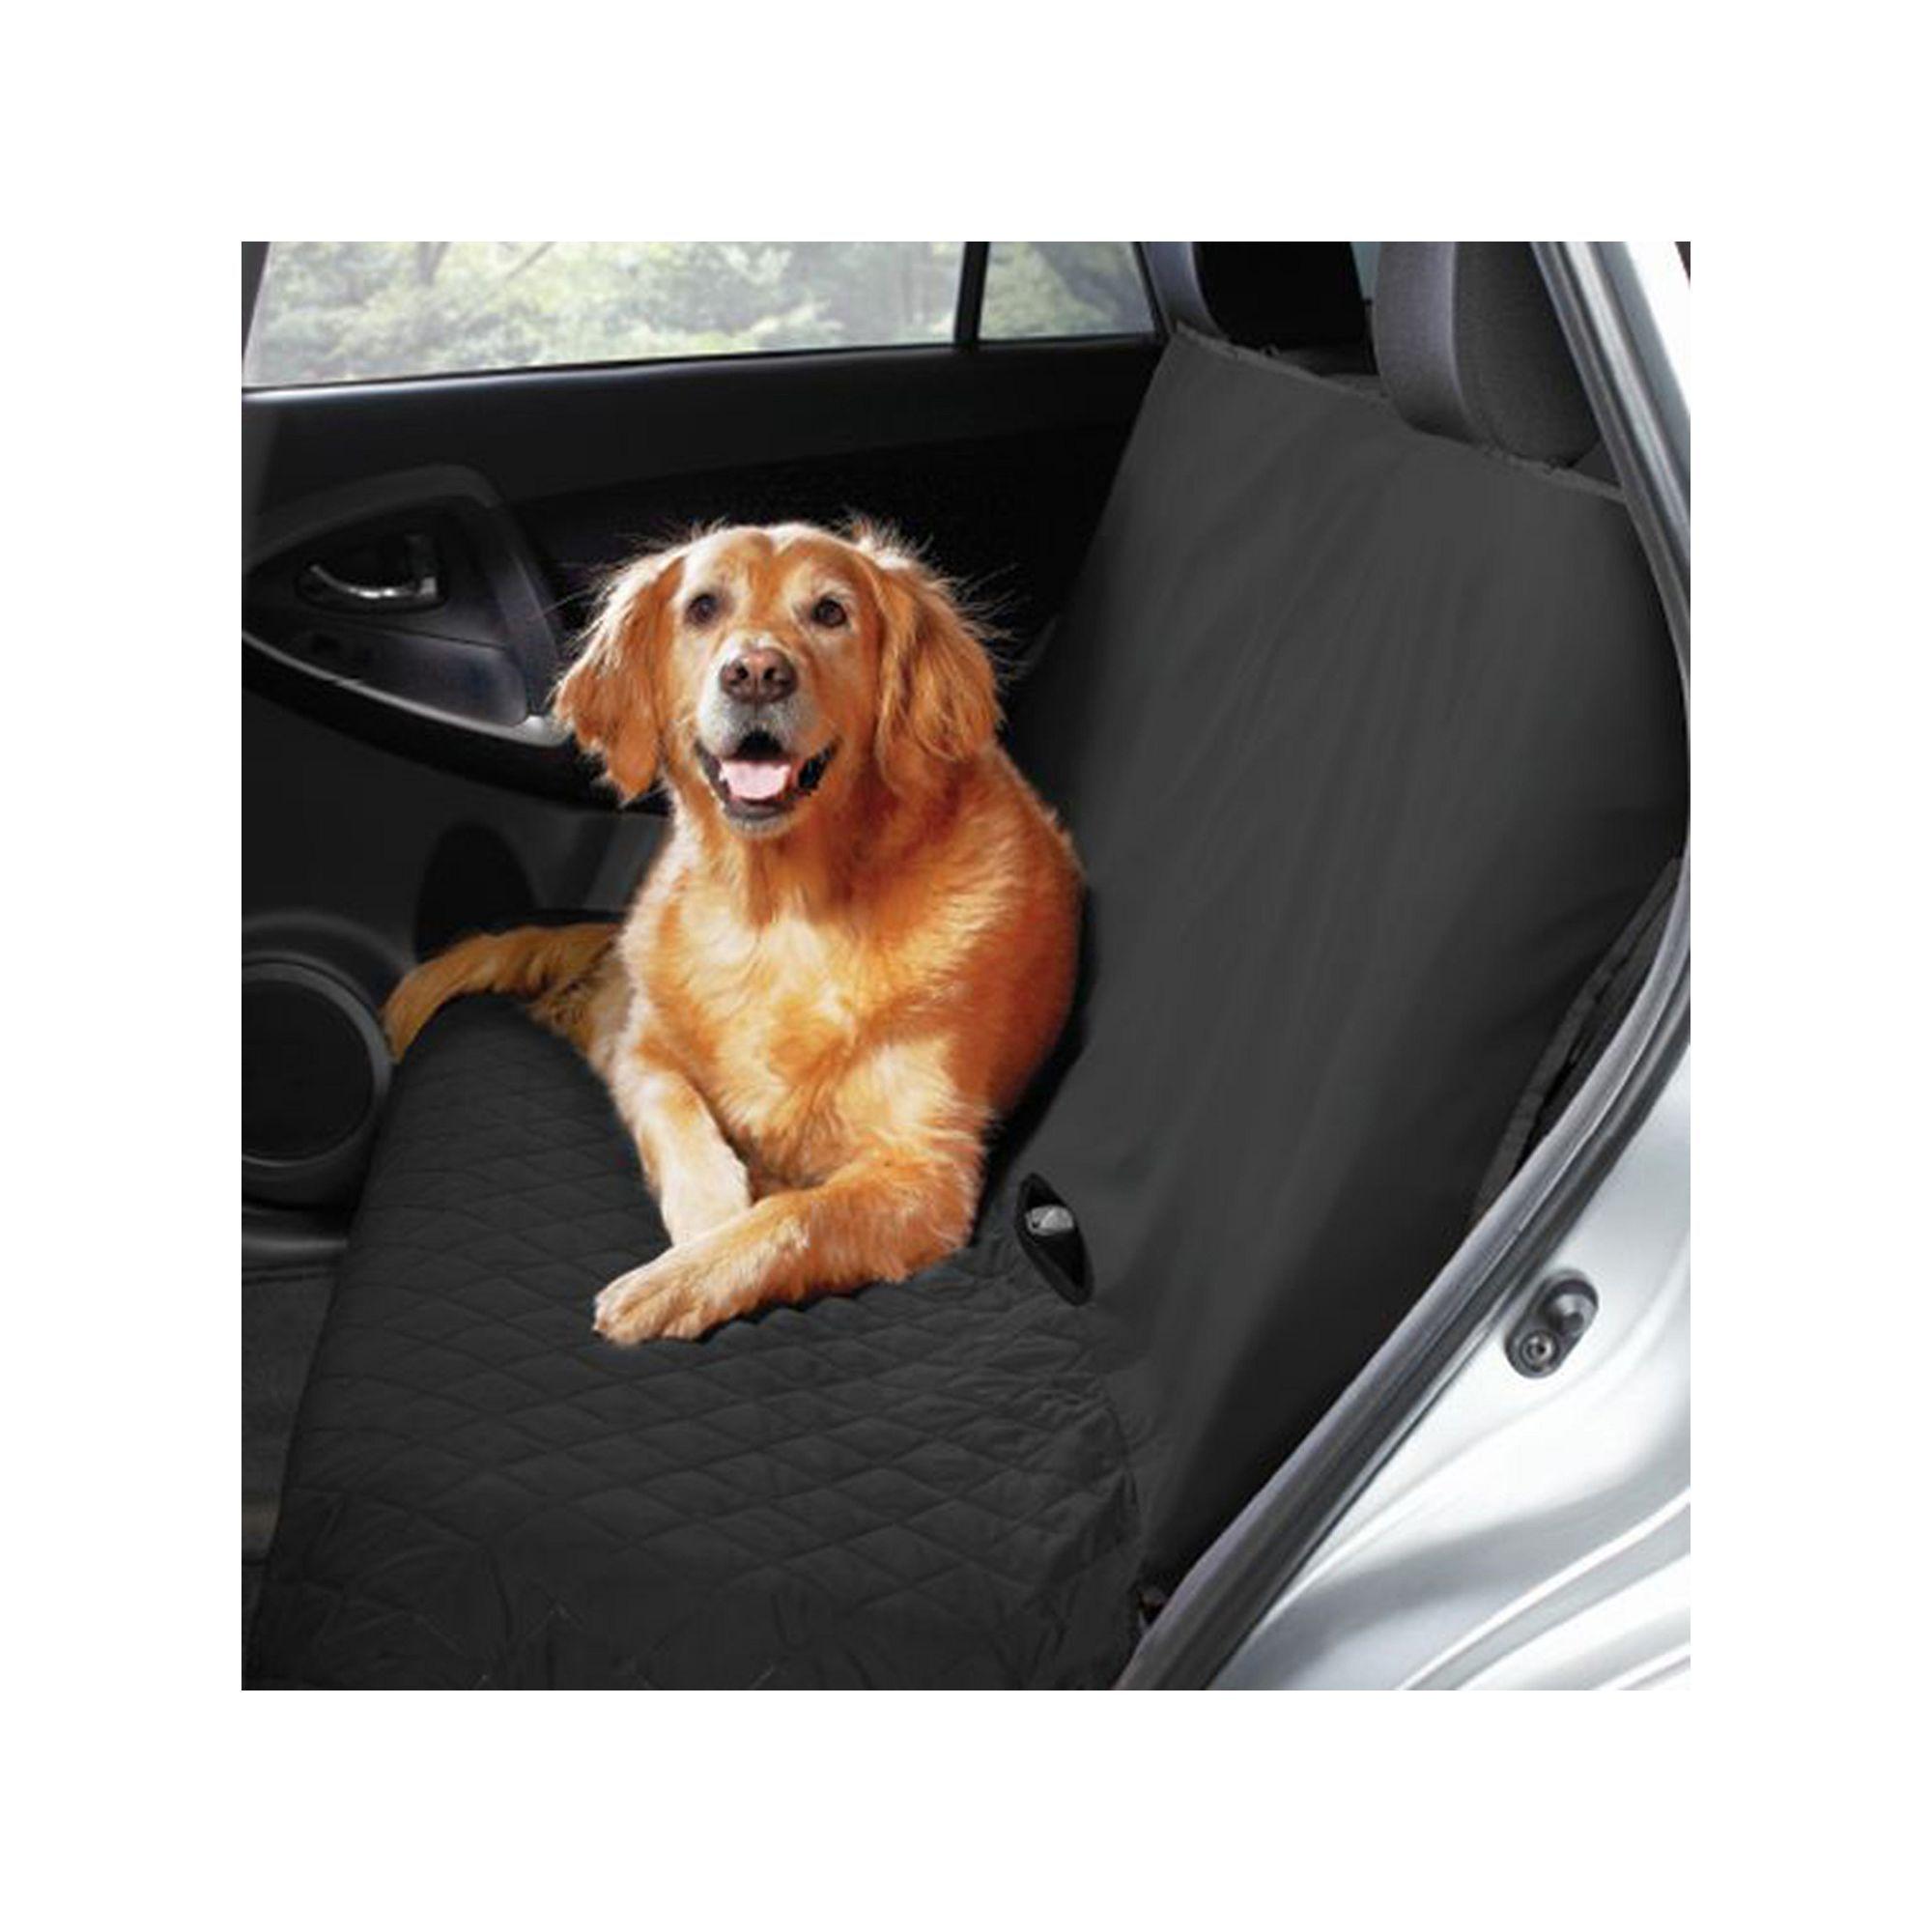 Yes Pets Waterproof Back Seat Cover, Black Pet car seat